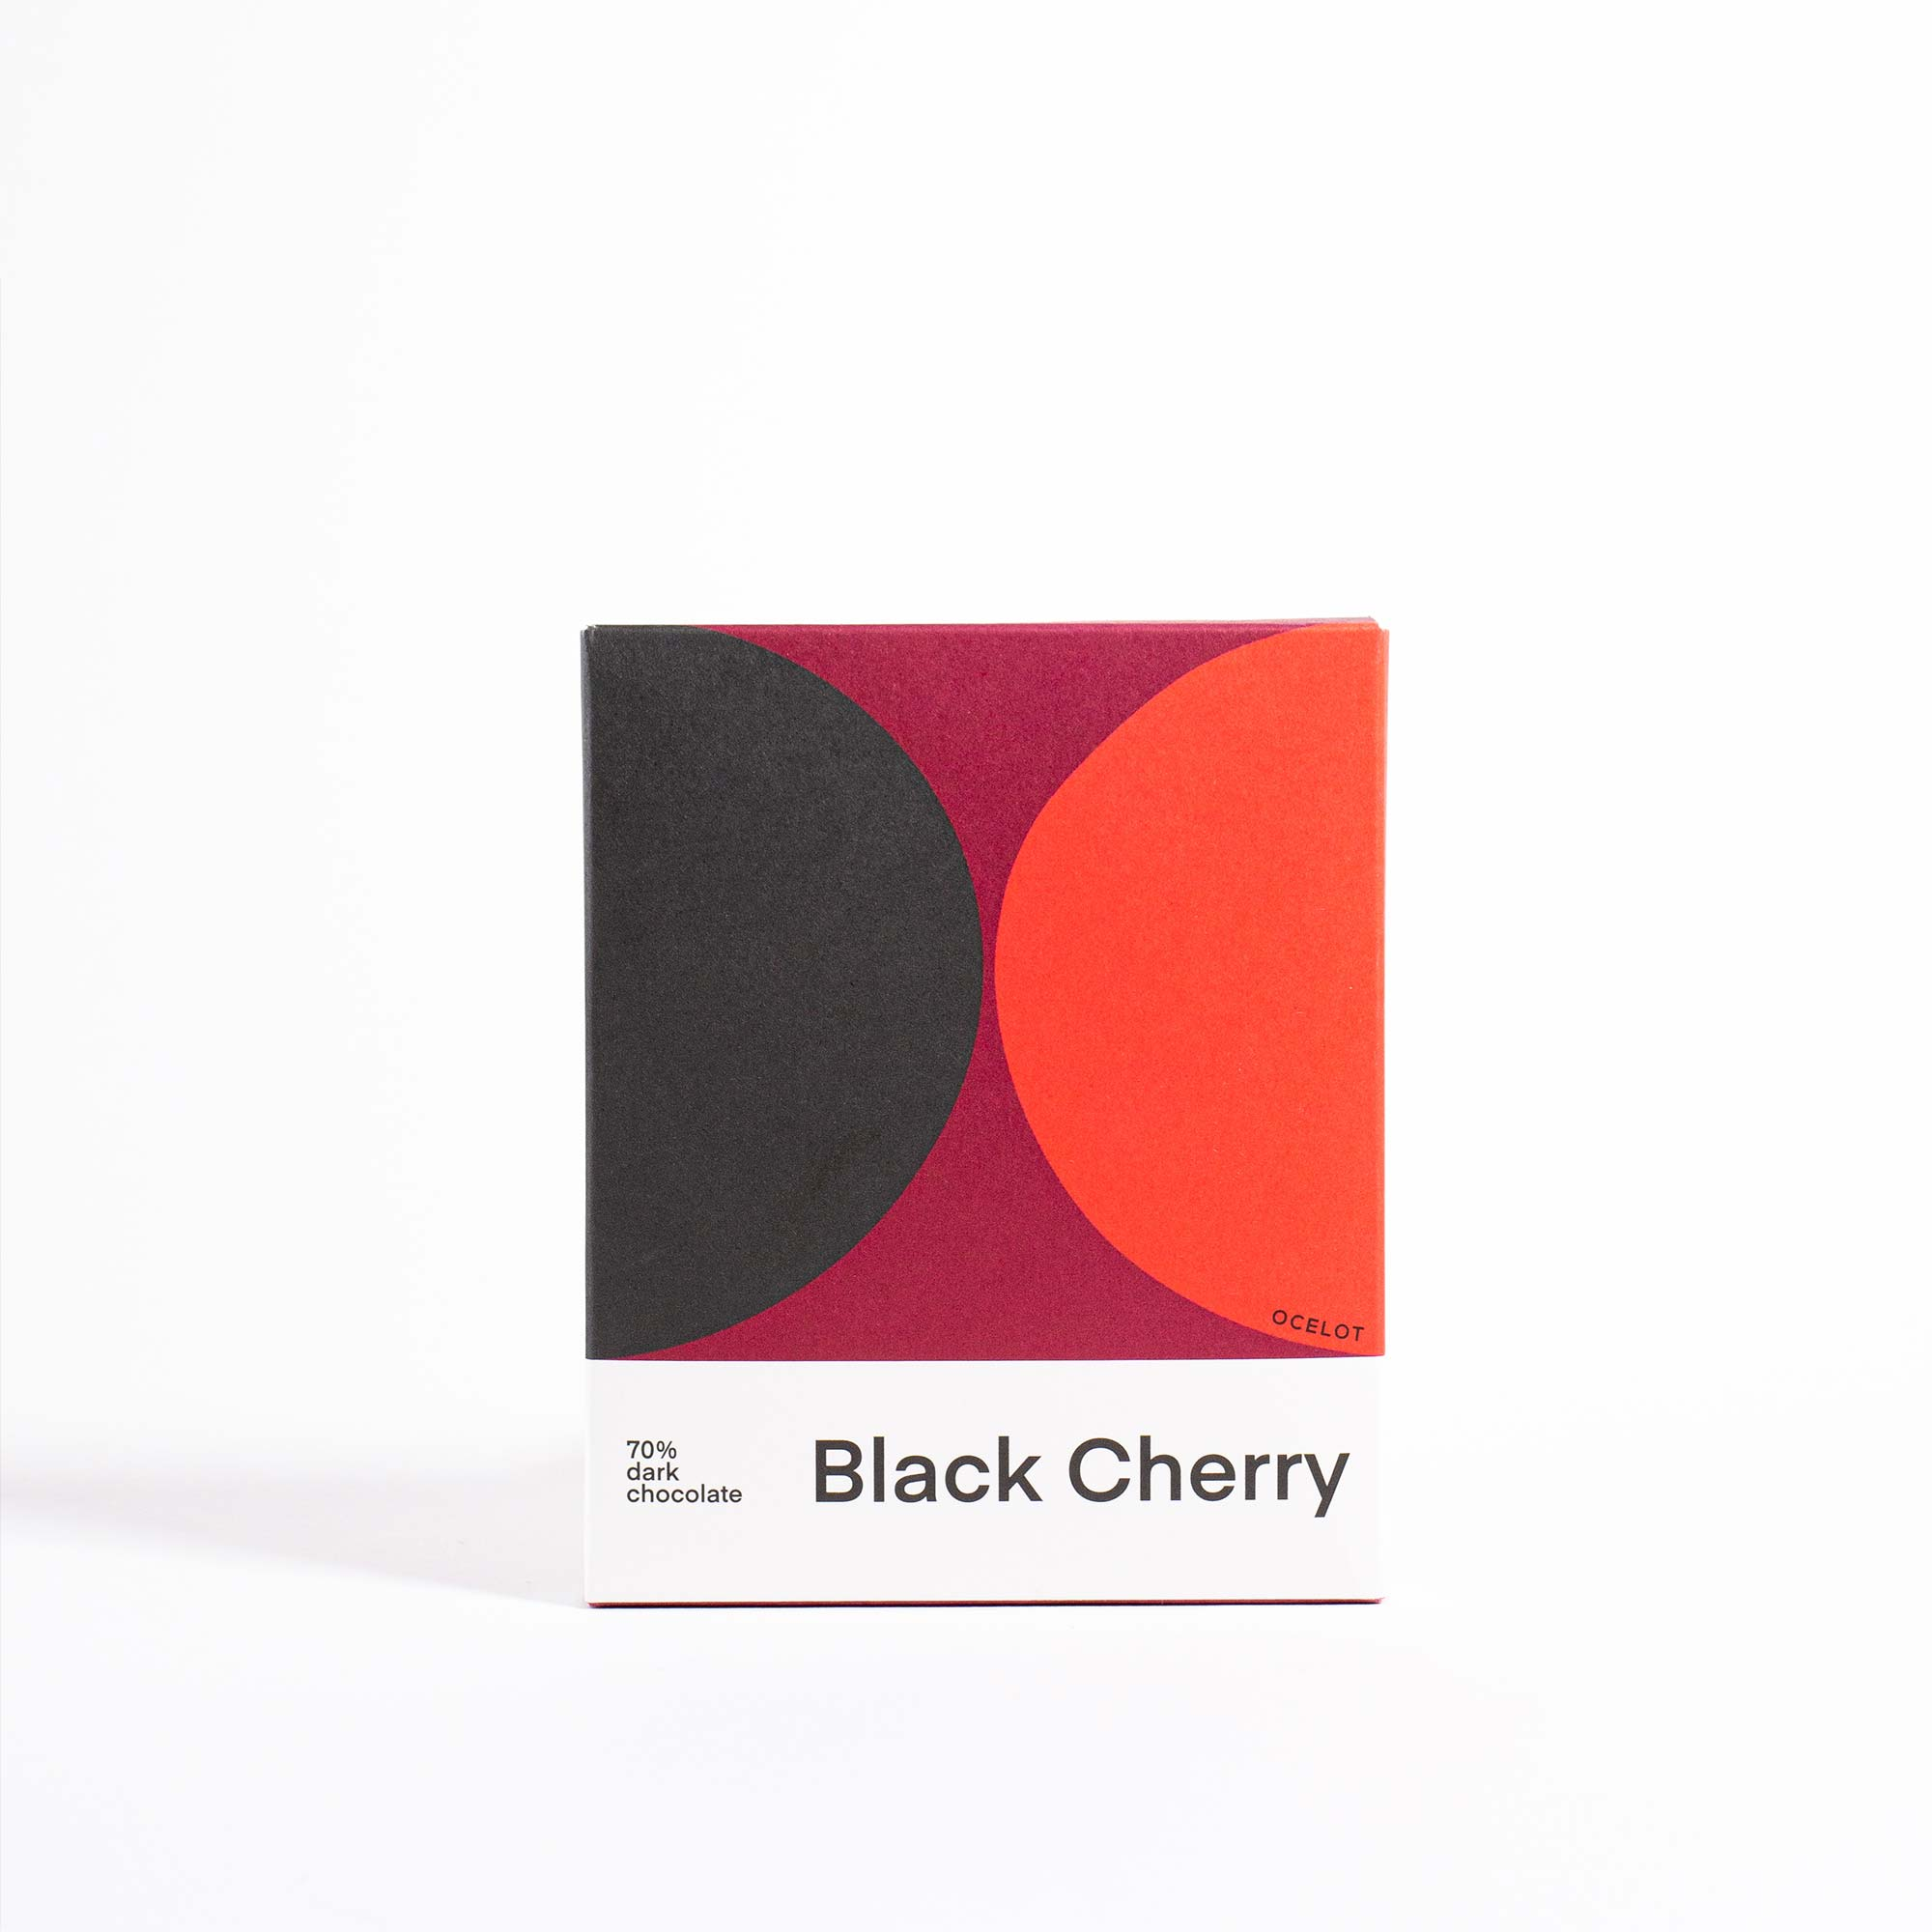 Grace and Green - OCELOT - Black Cherry 1